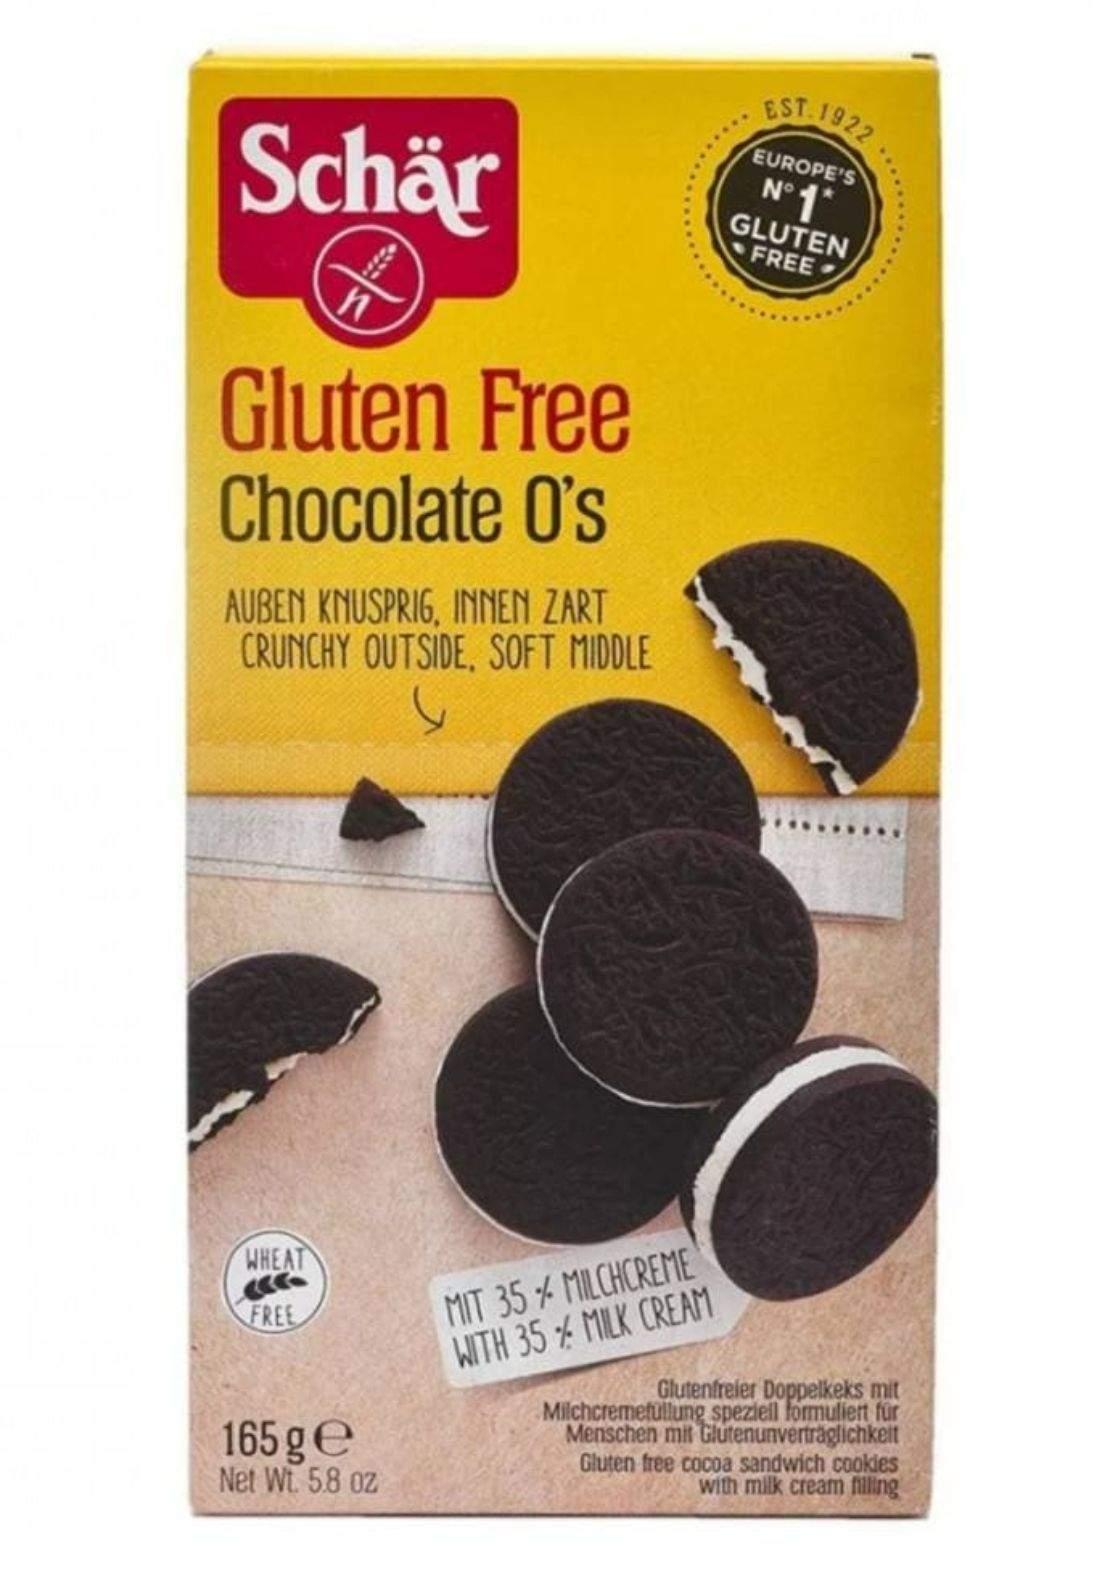 Cocoa sandwich cookies  165g كوكيز خالي من الغلوتين